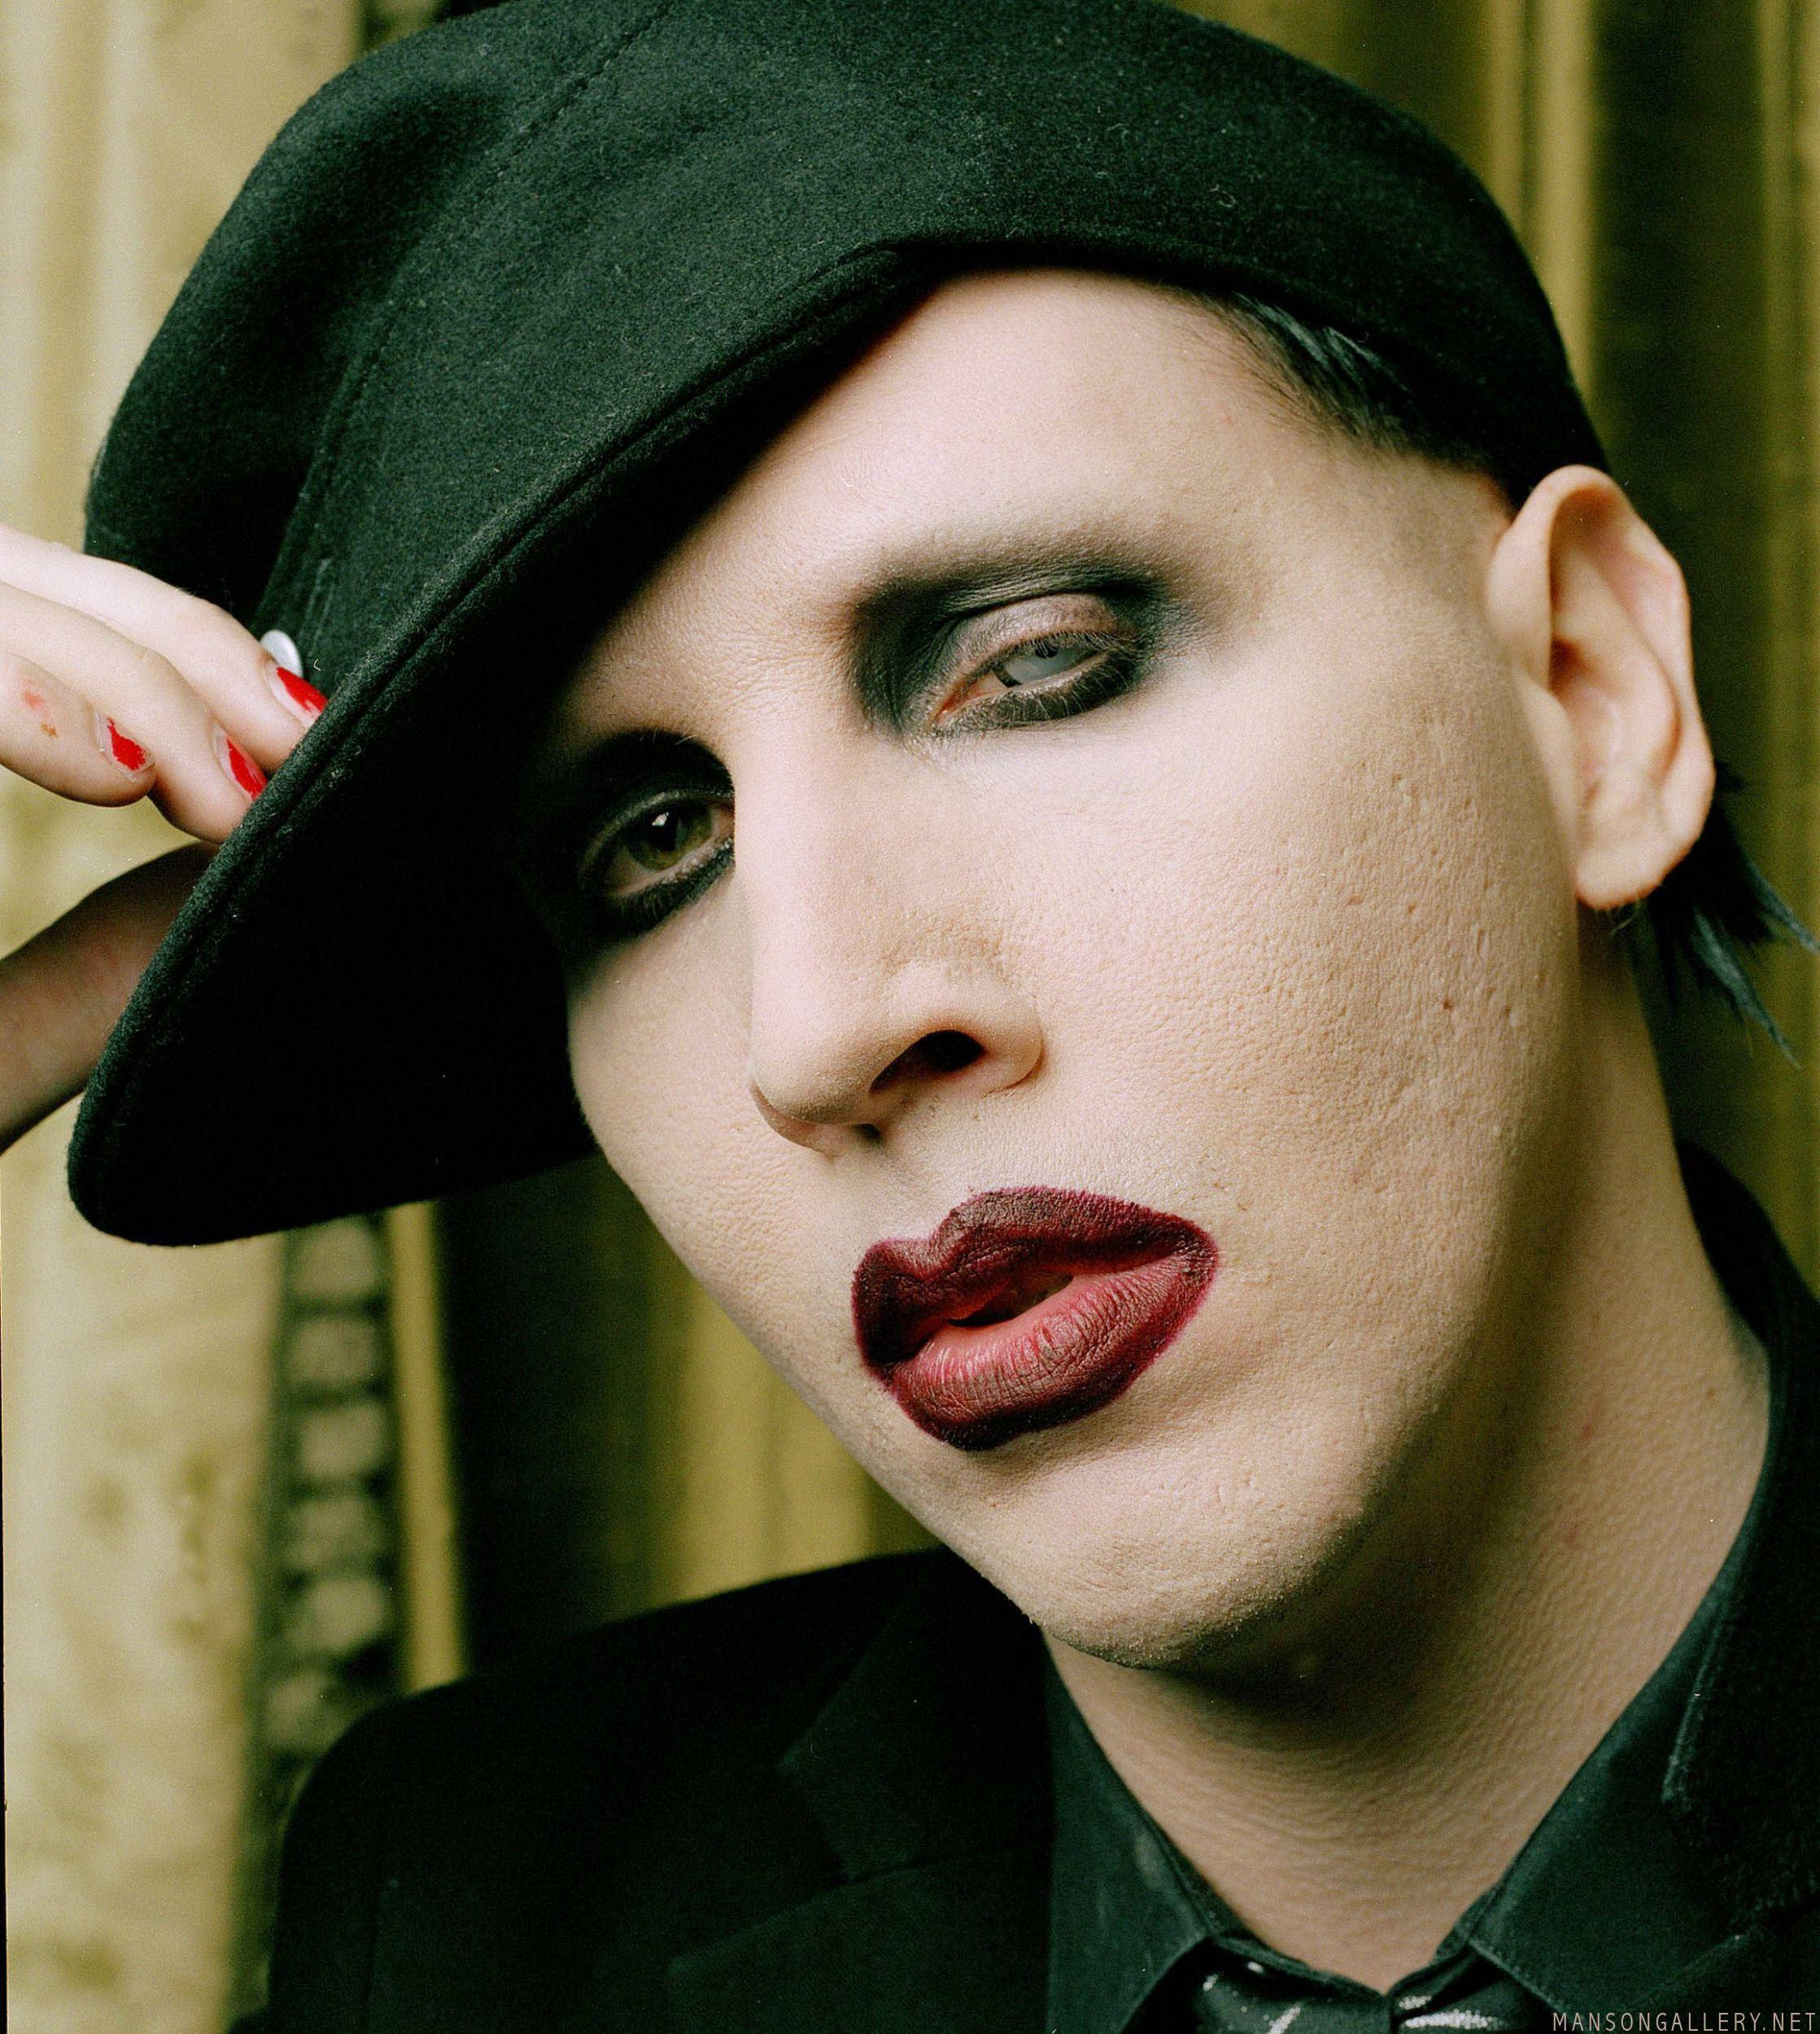 Marilyn Manson - Marilyn Manson Photo (29937384) - Fanpop